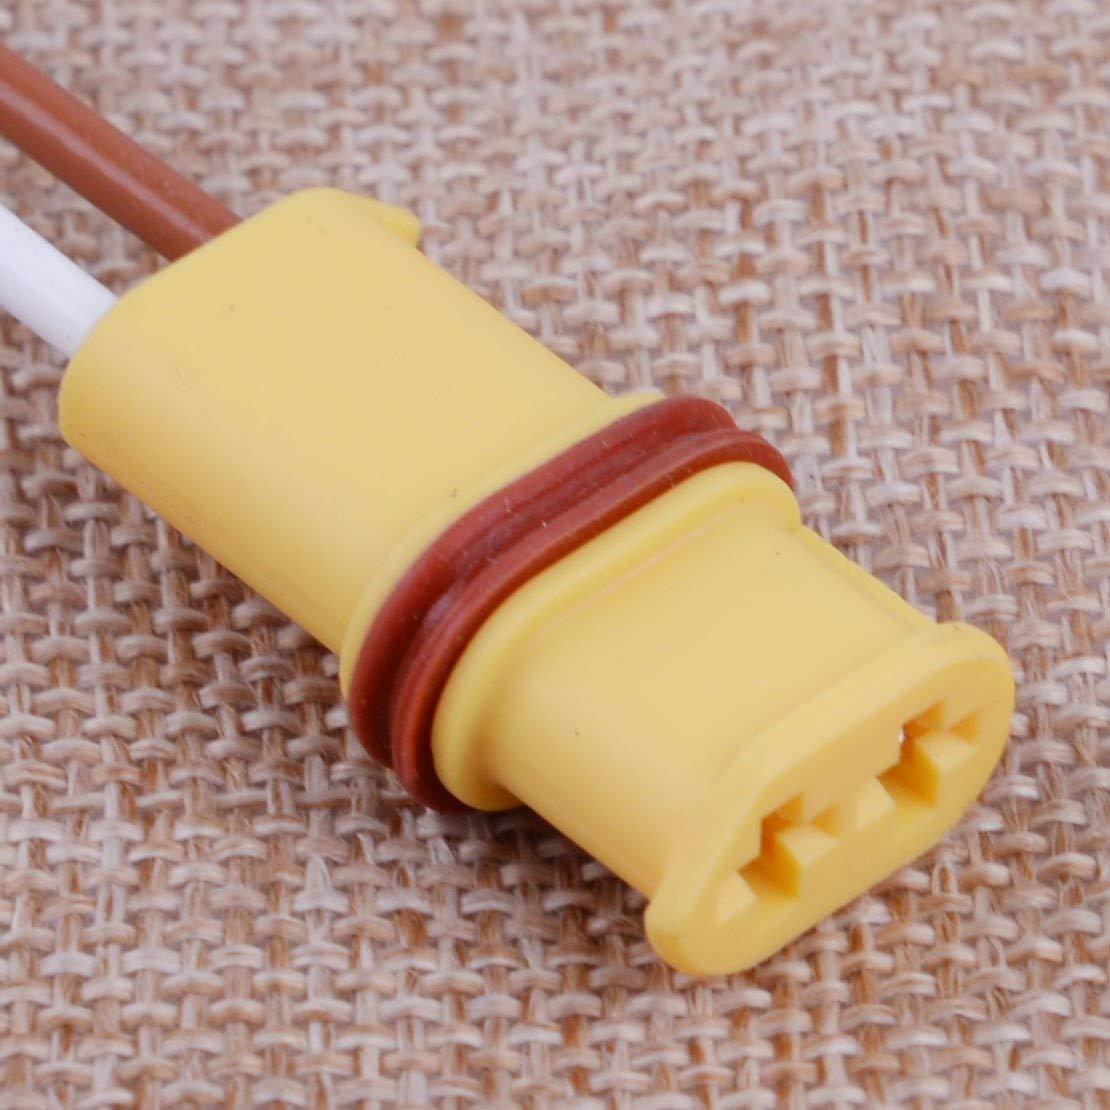 Glow Plug 2 Pin 12V Fit for Eberspacher Espar Airtronic Heater D2 D4 D4S 252069011300 Silicon Nitride /&Plastic /&Rubber Star-Shopinc